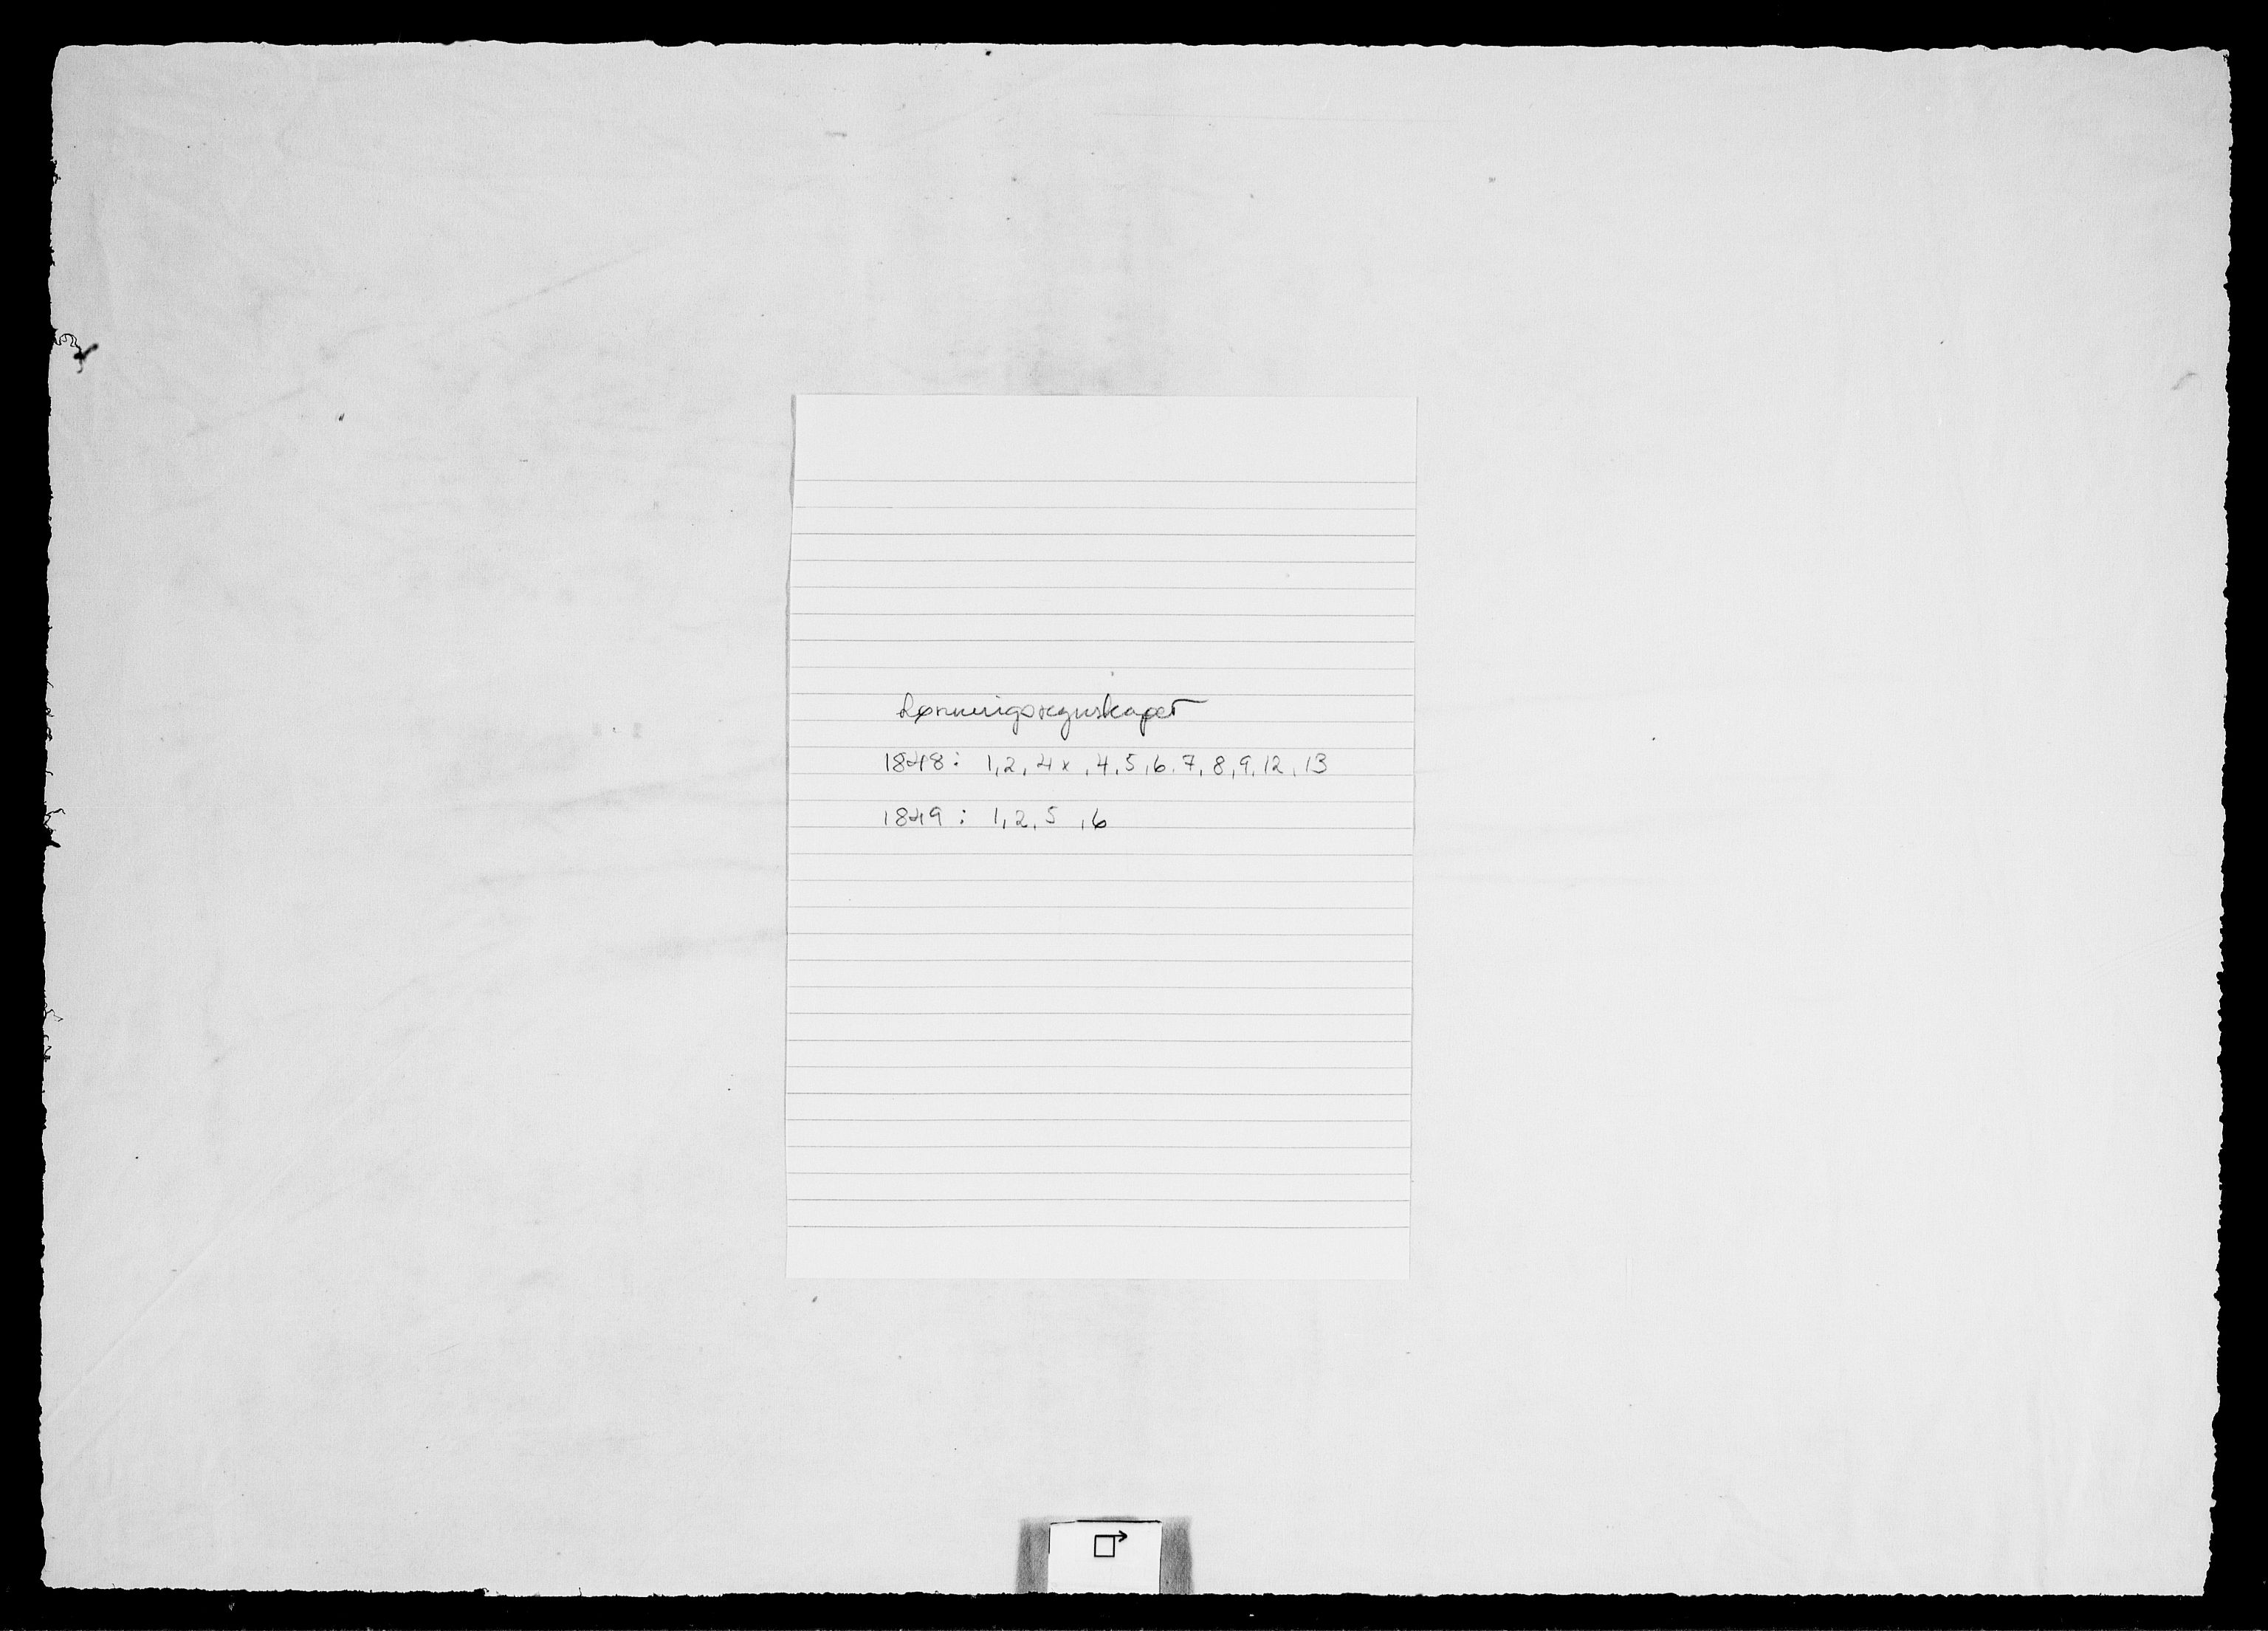 RA, Modums Blaafarveværk, G/Gd/Gdd/L0284, 1848-1849, s. 2